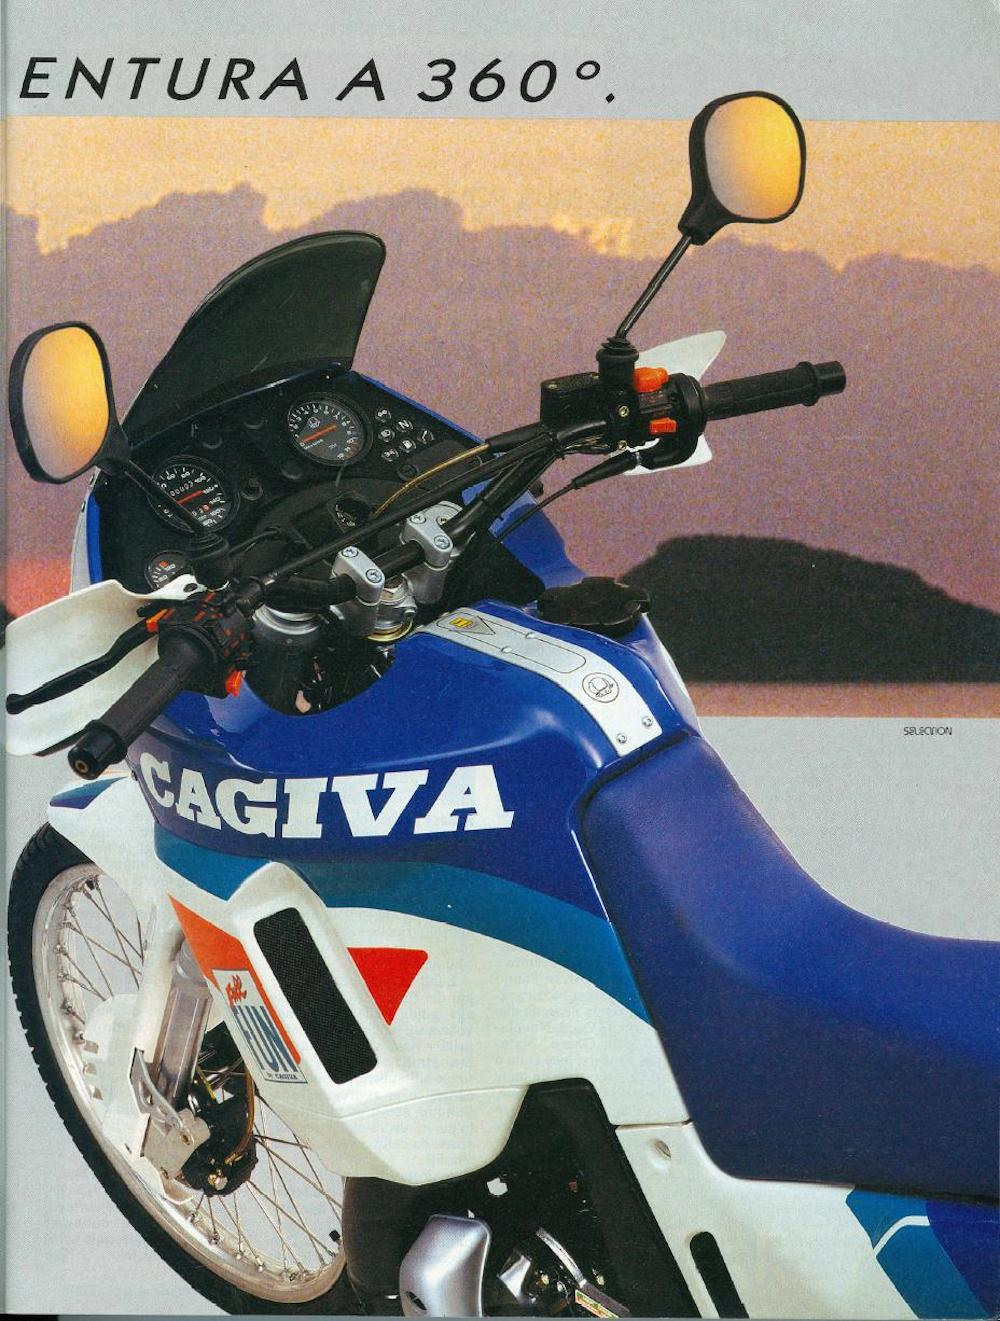 ADV Cagiva N90a